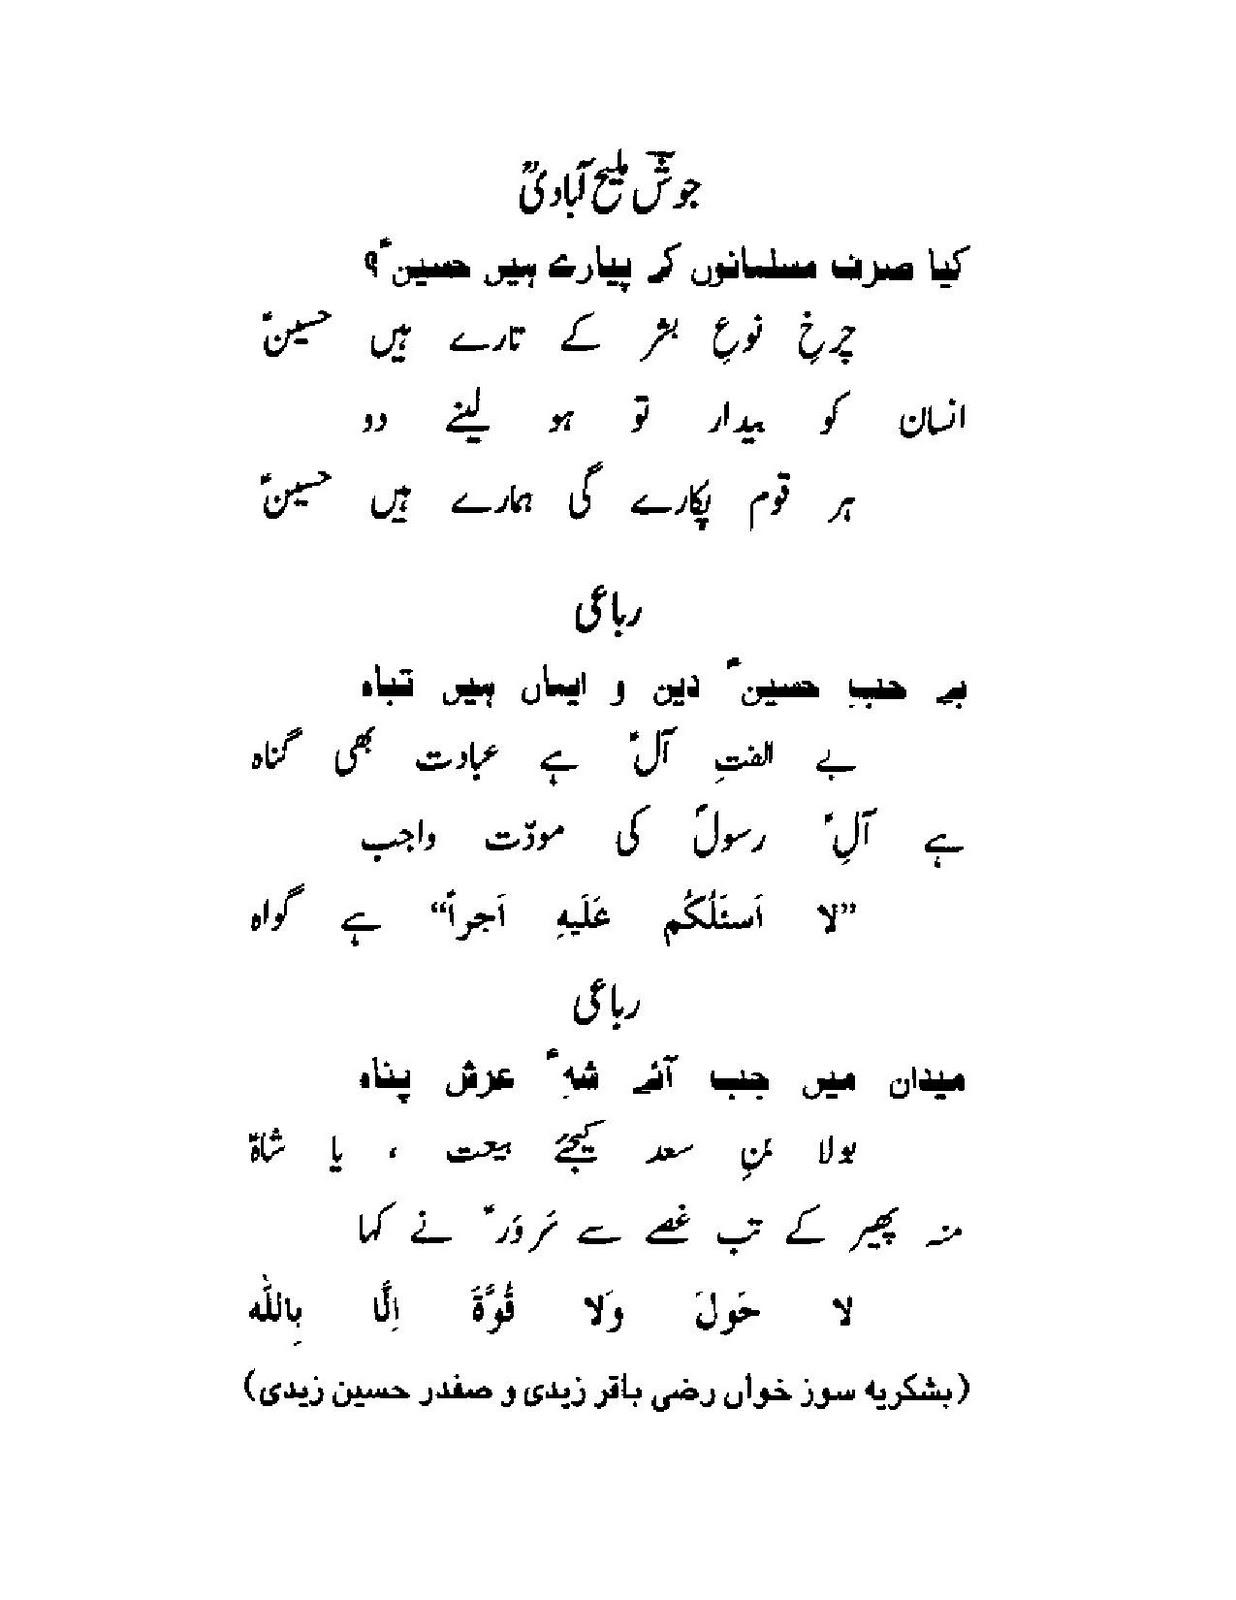 Basta By Sibte Jafar Soz Salam Marsiya Noha: December 2011